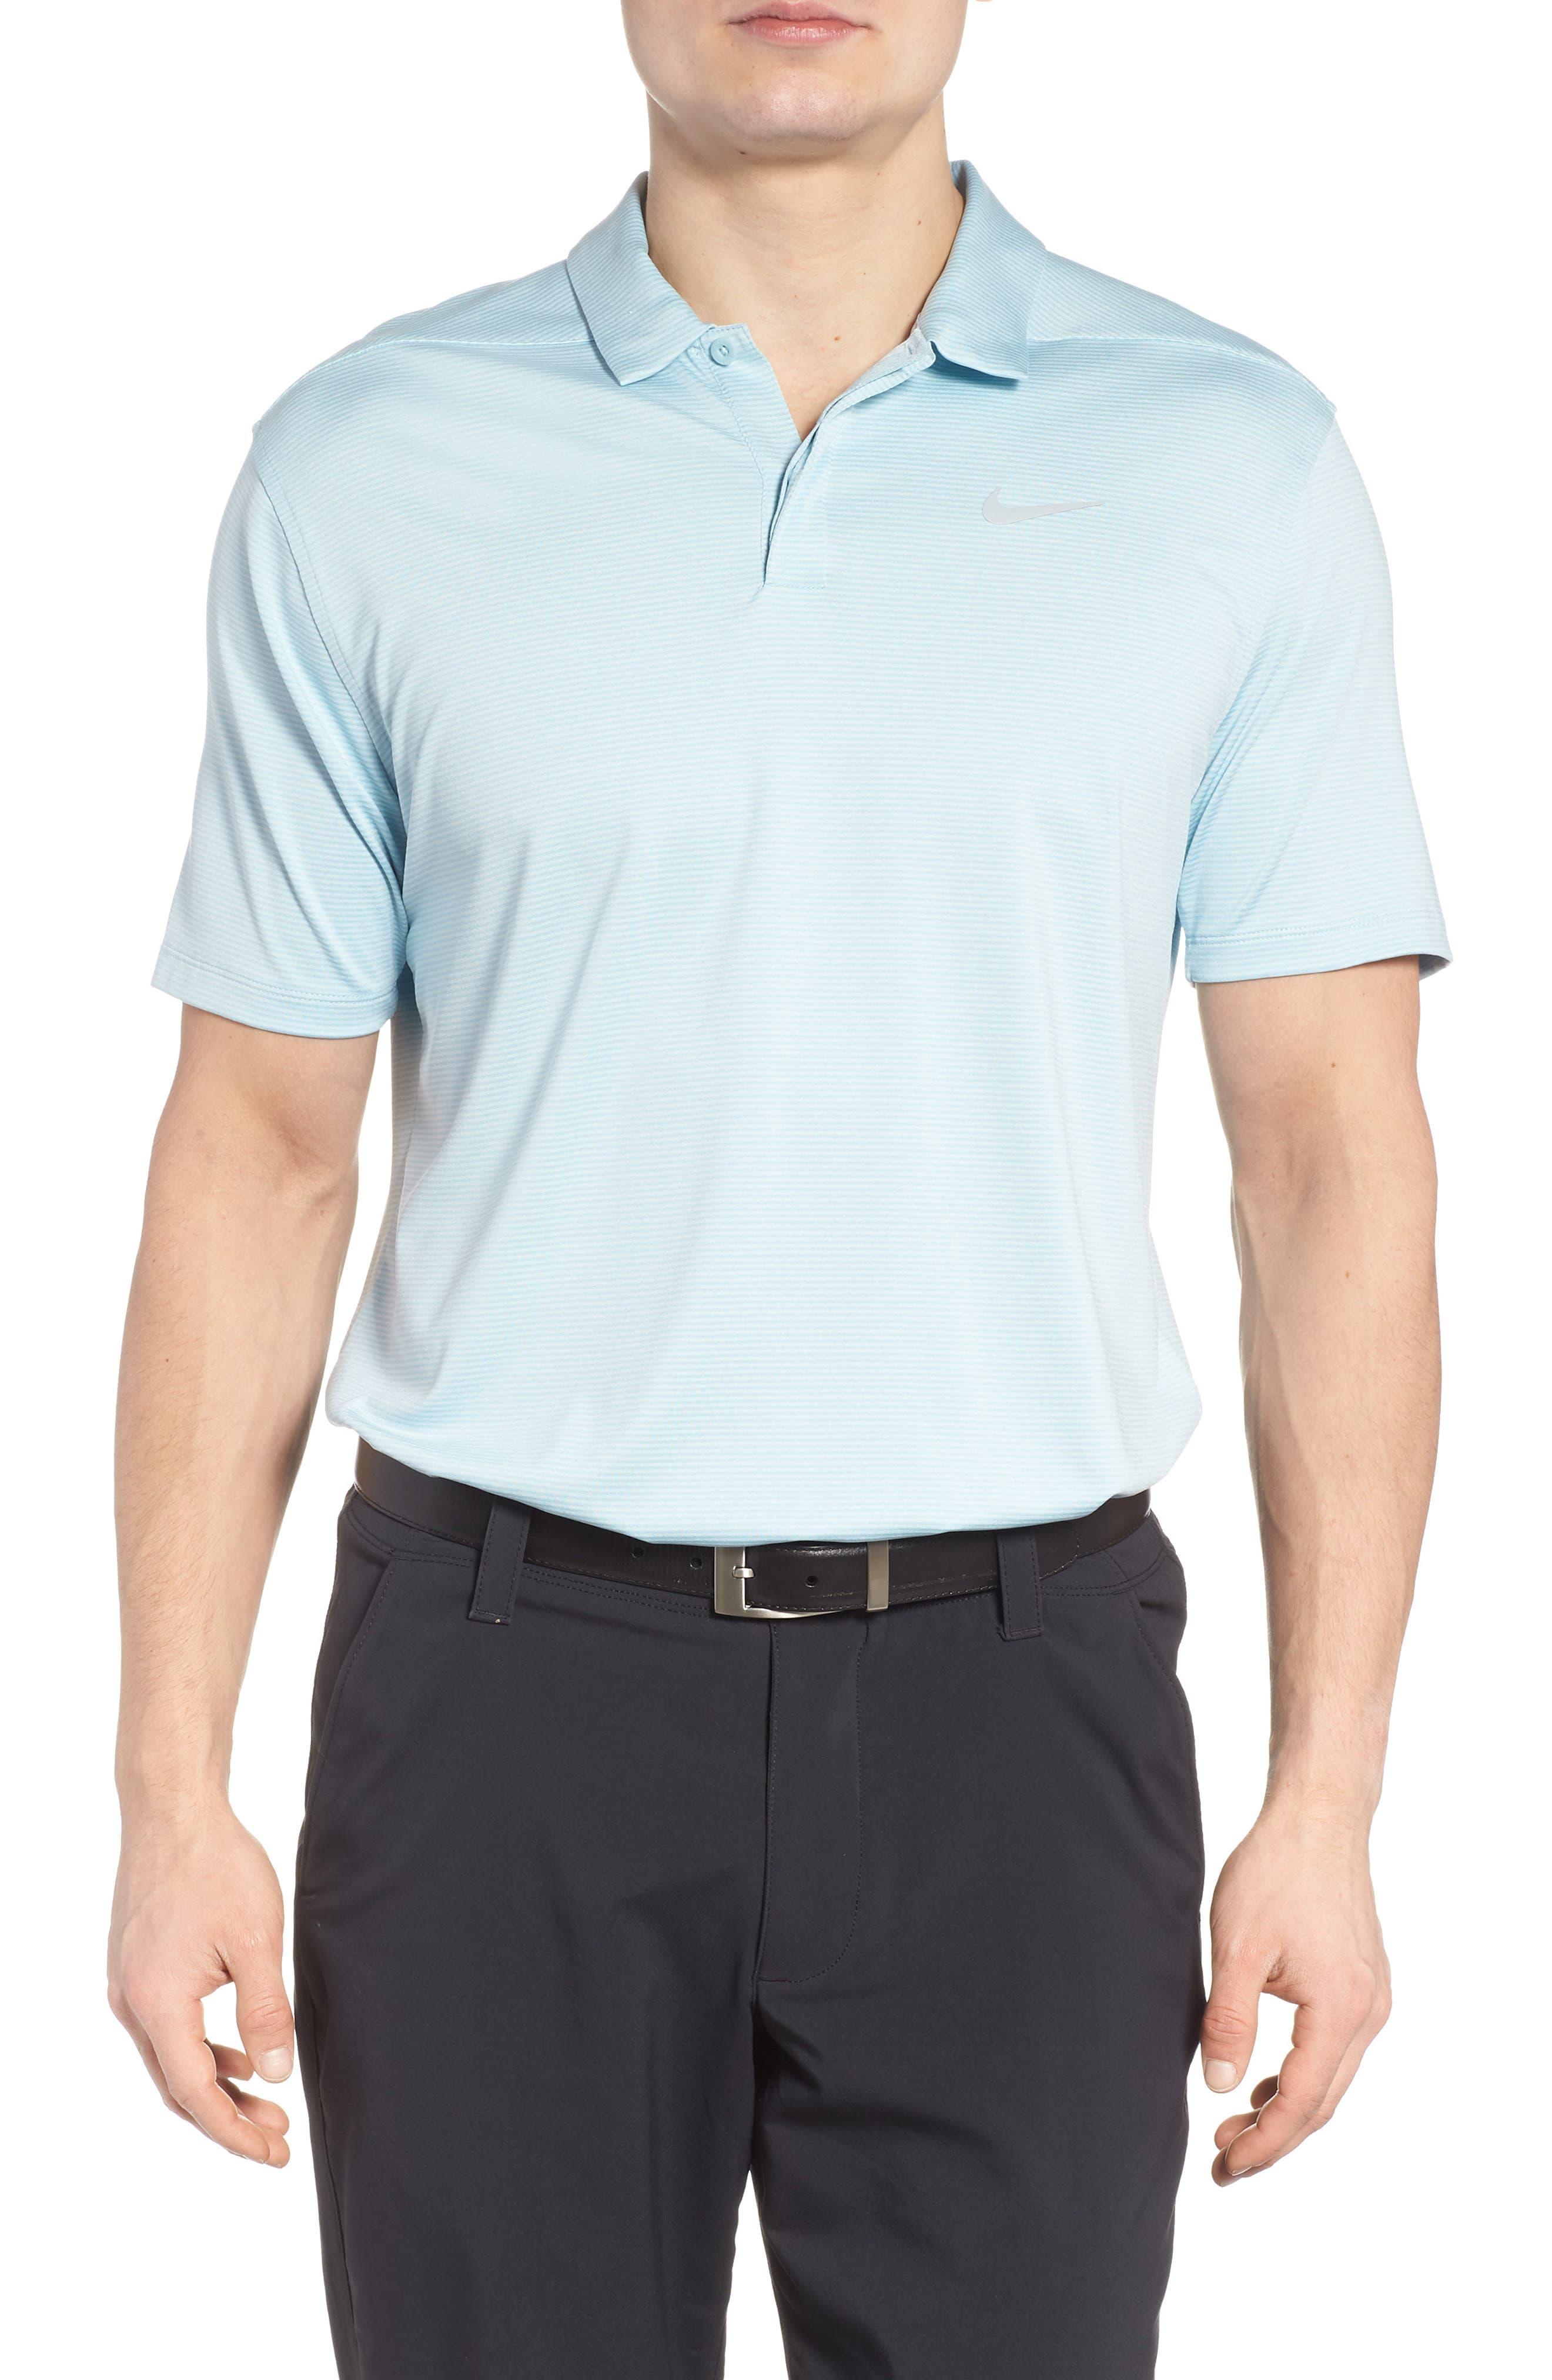 Dry Polo Shirt,                             Main thumbnail 1, color,                             OCEAN BLISS/ SILVER